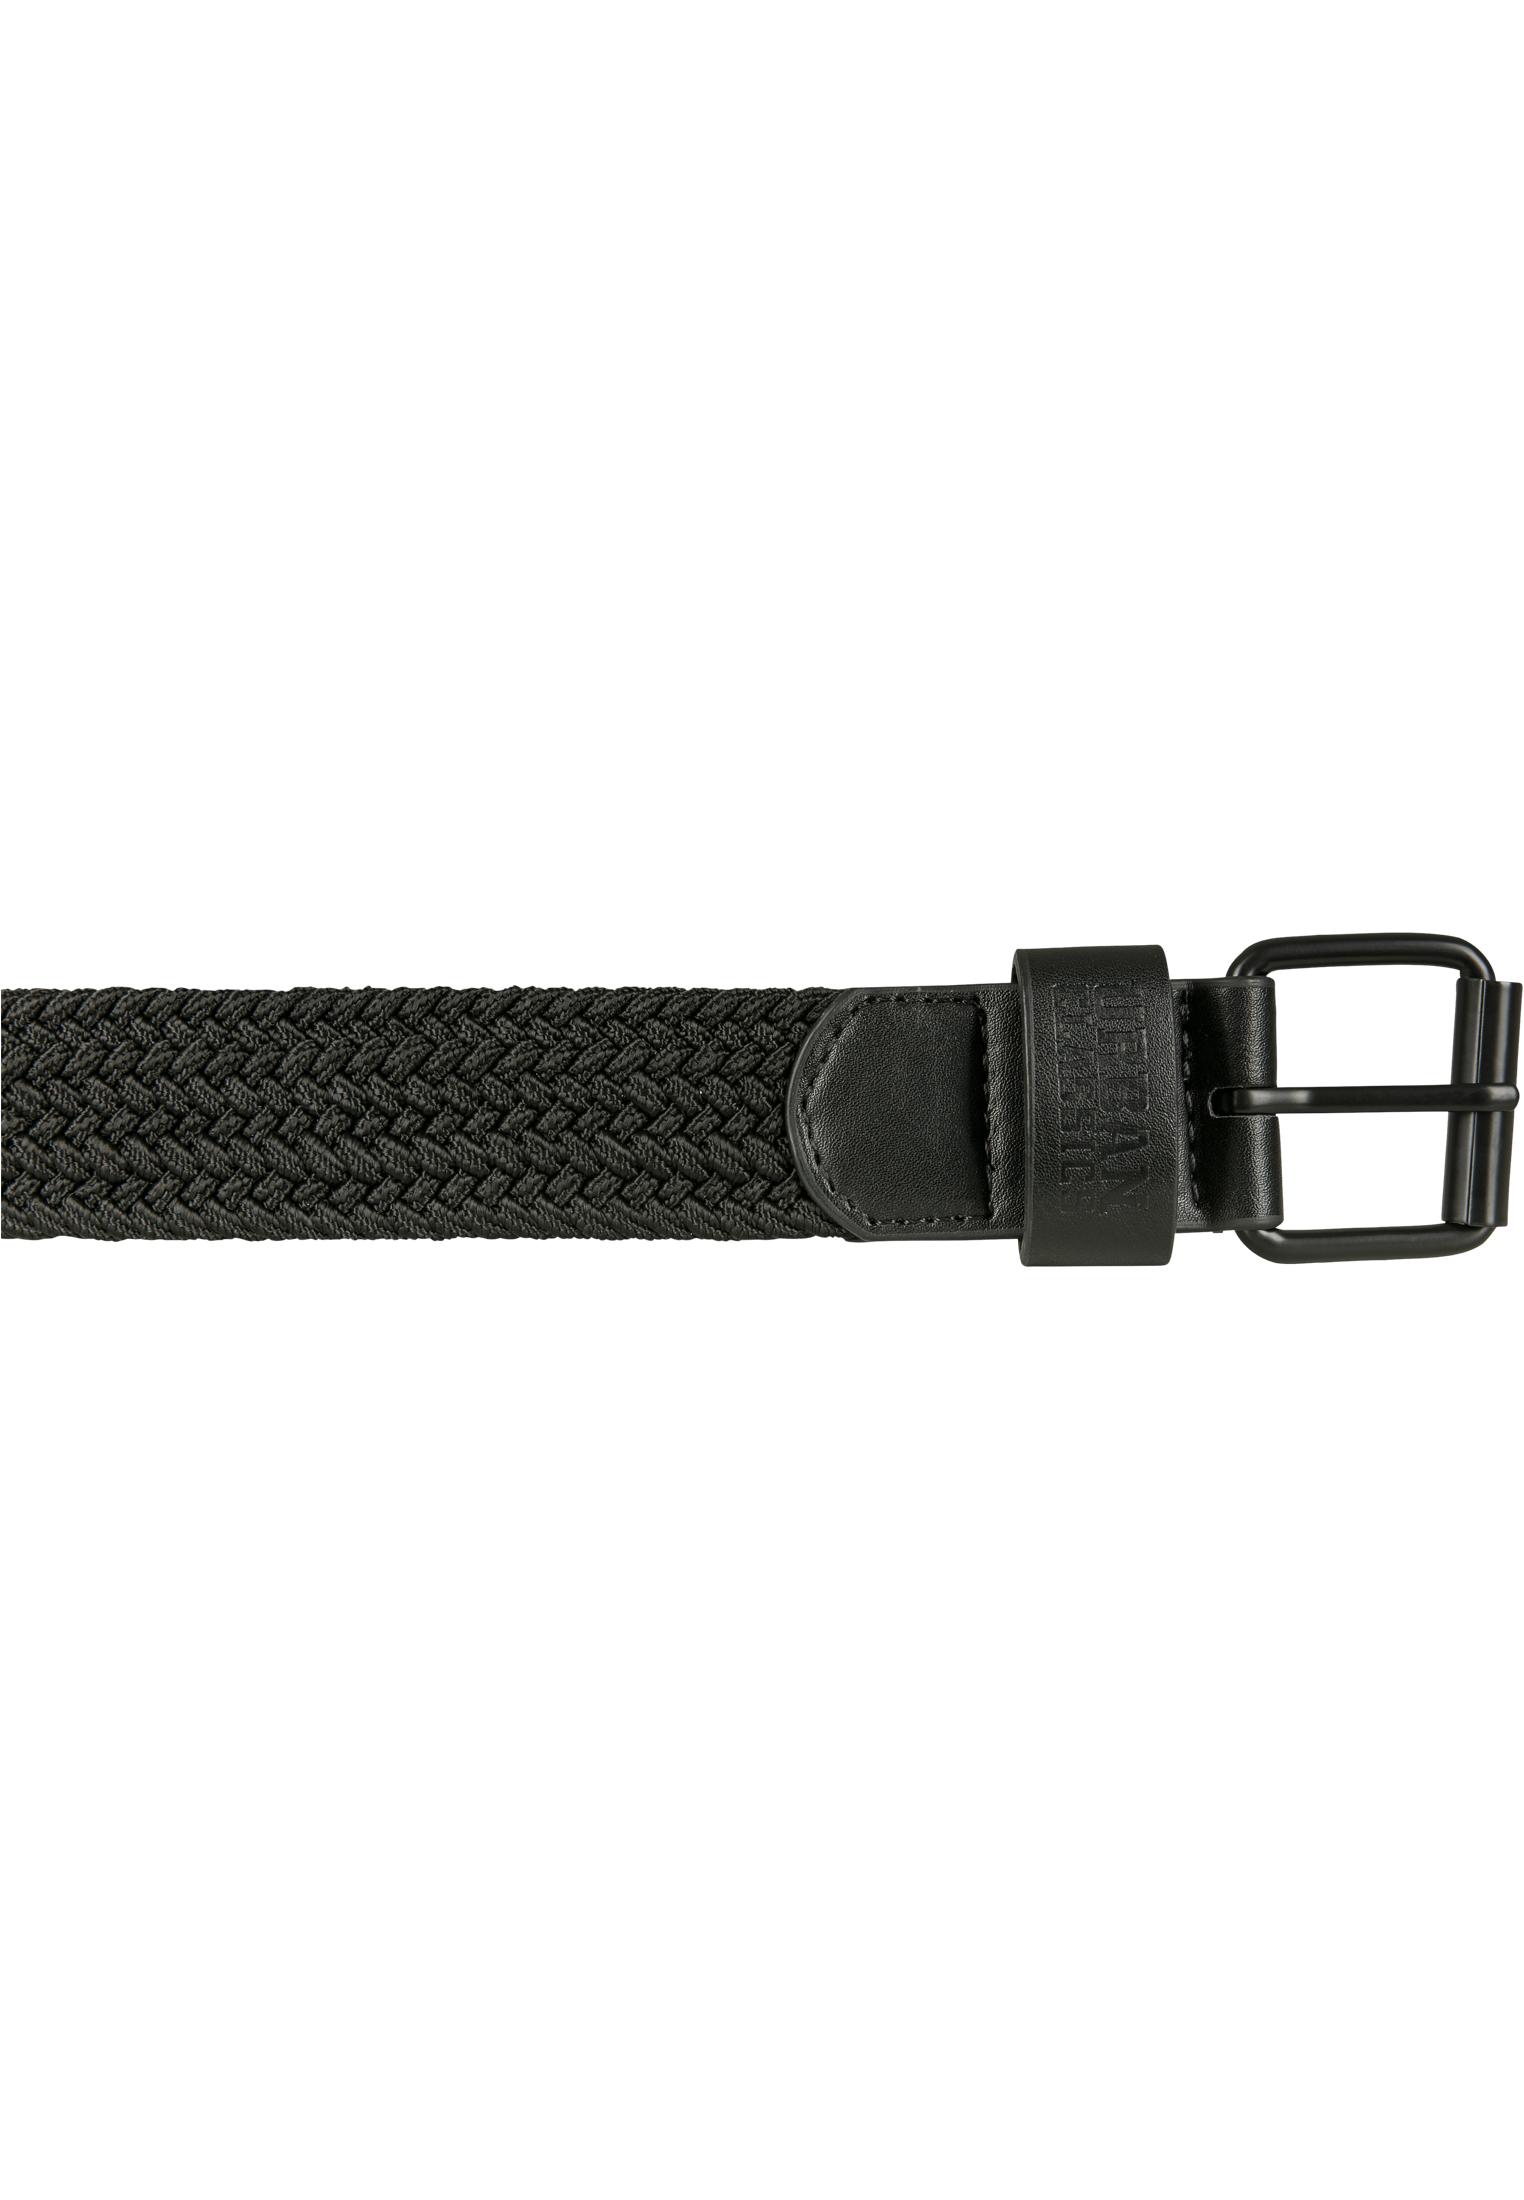 Urban-Classics-Herren-Guertel-casual-Leather-Imitation-Belt Indexbild 9